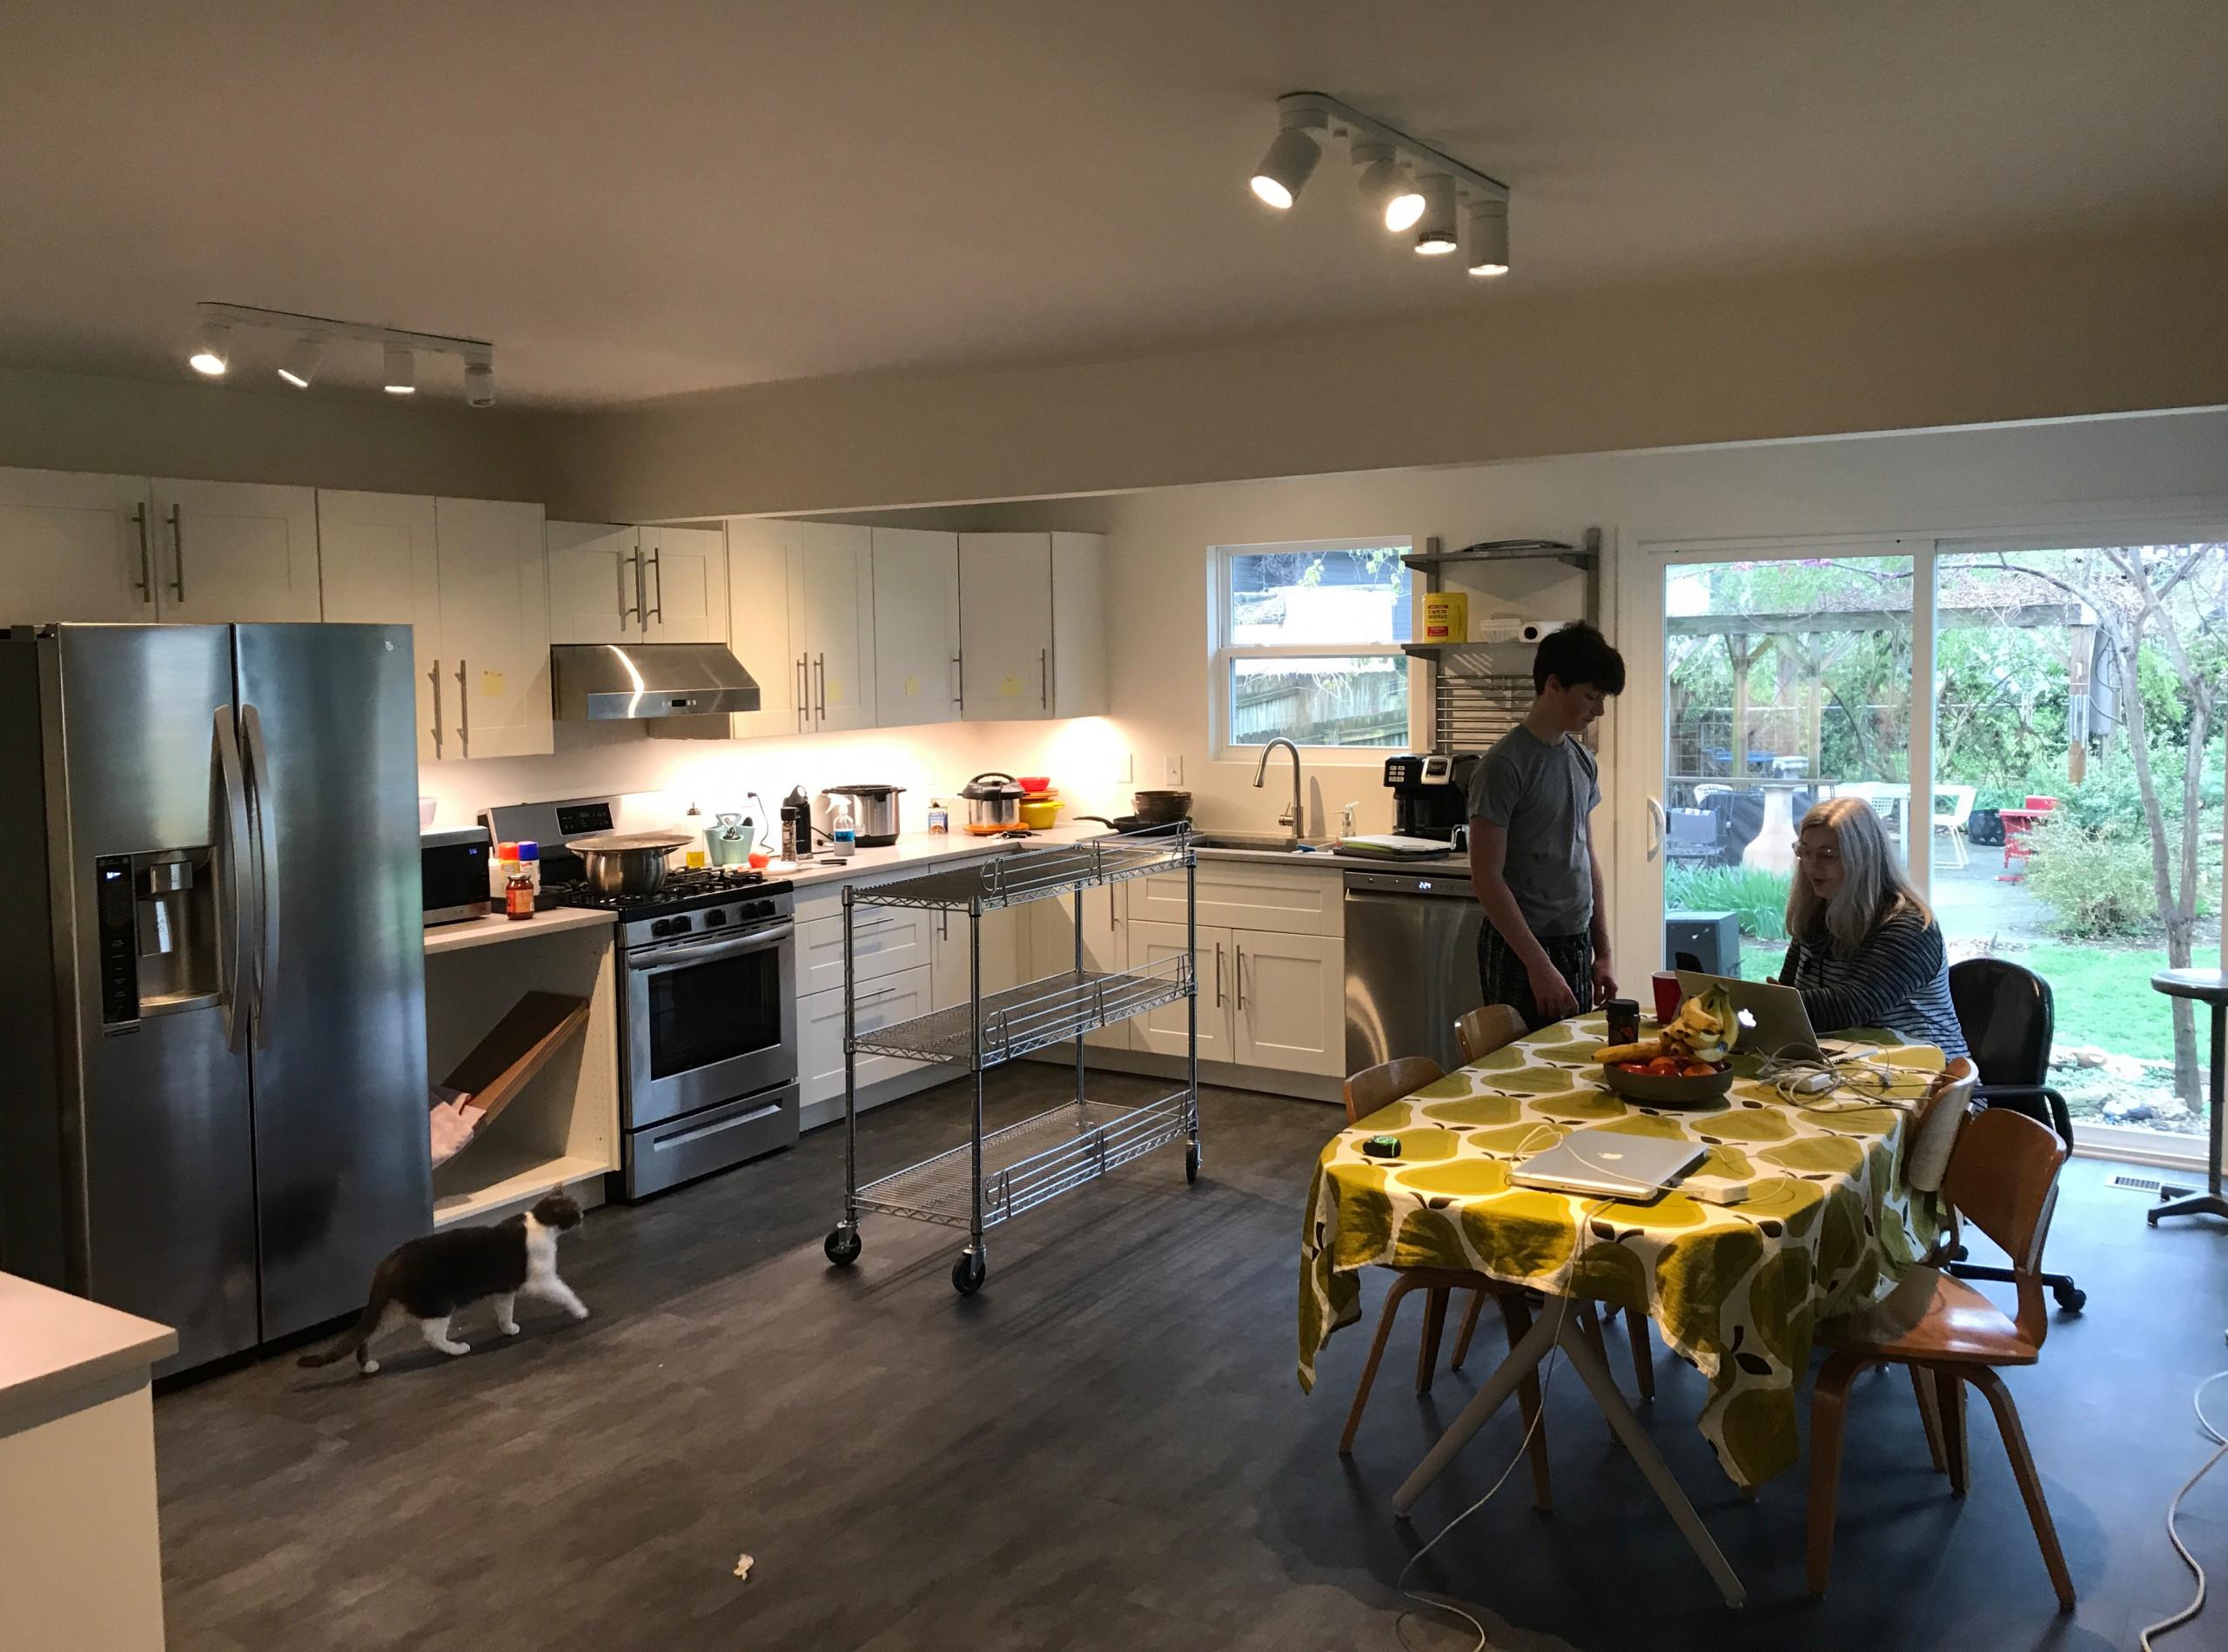 Stoecklein Residence - Sunroom/Kitchen Expansion - Custom Design